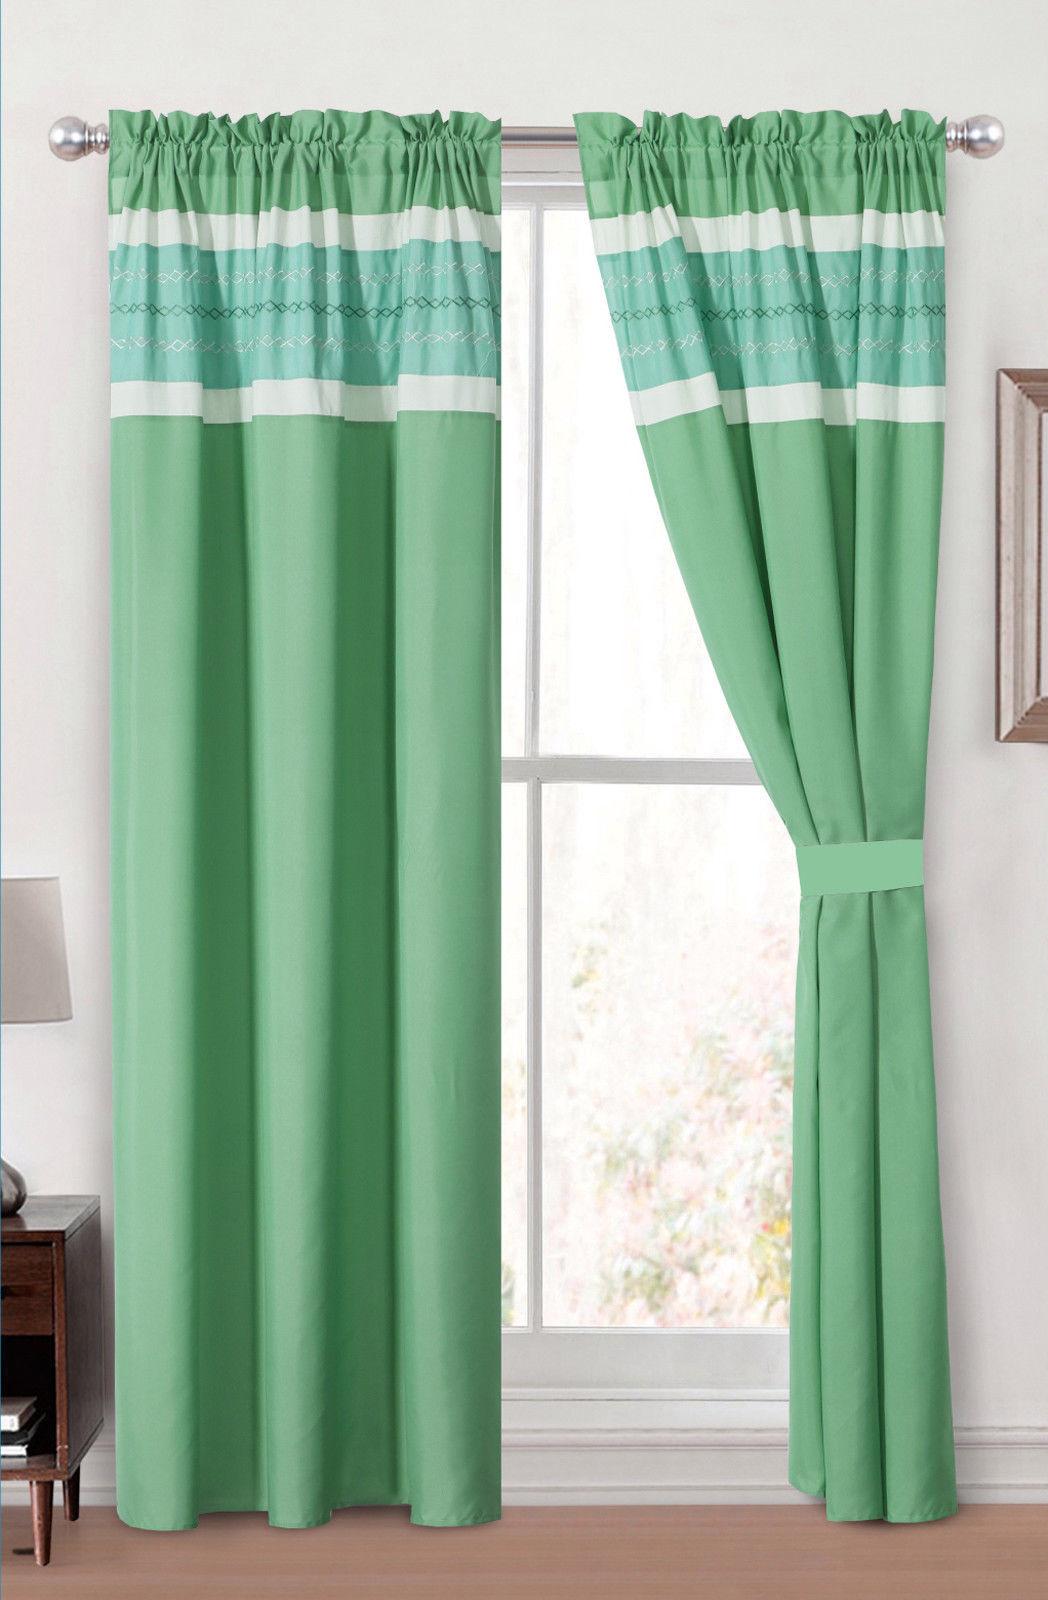 4P Mica Diamond Geometric Embroidery Curtain Set Green Blue Cucumber Sheer Liner - $40.89